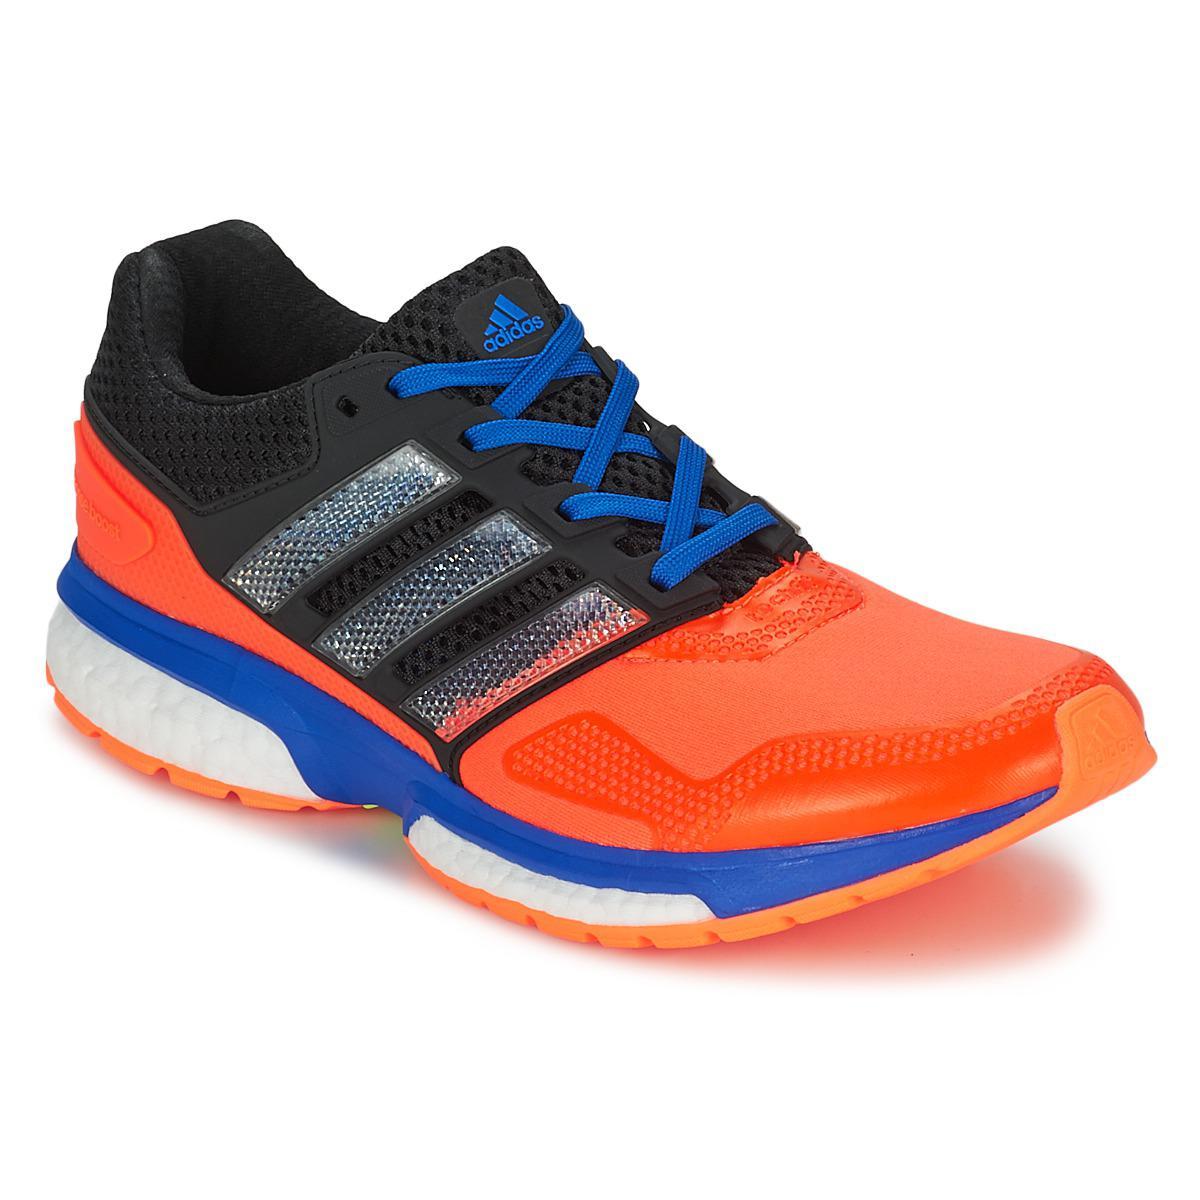 Adidas RESPONSE Boost 2 D corriendo formadores en naranja para hombres salvar